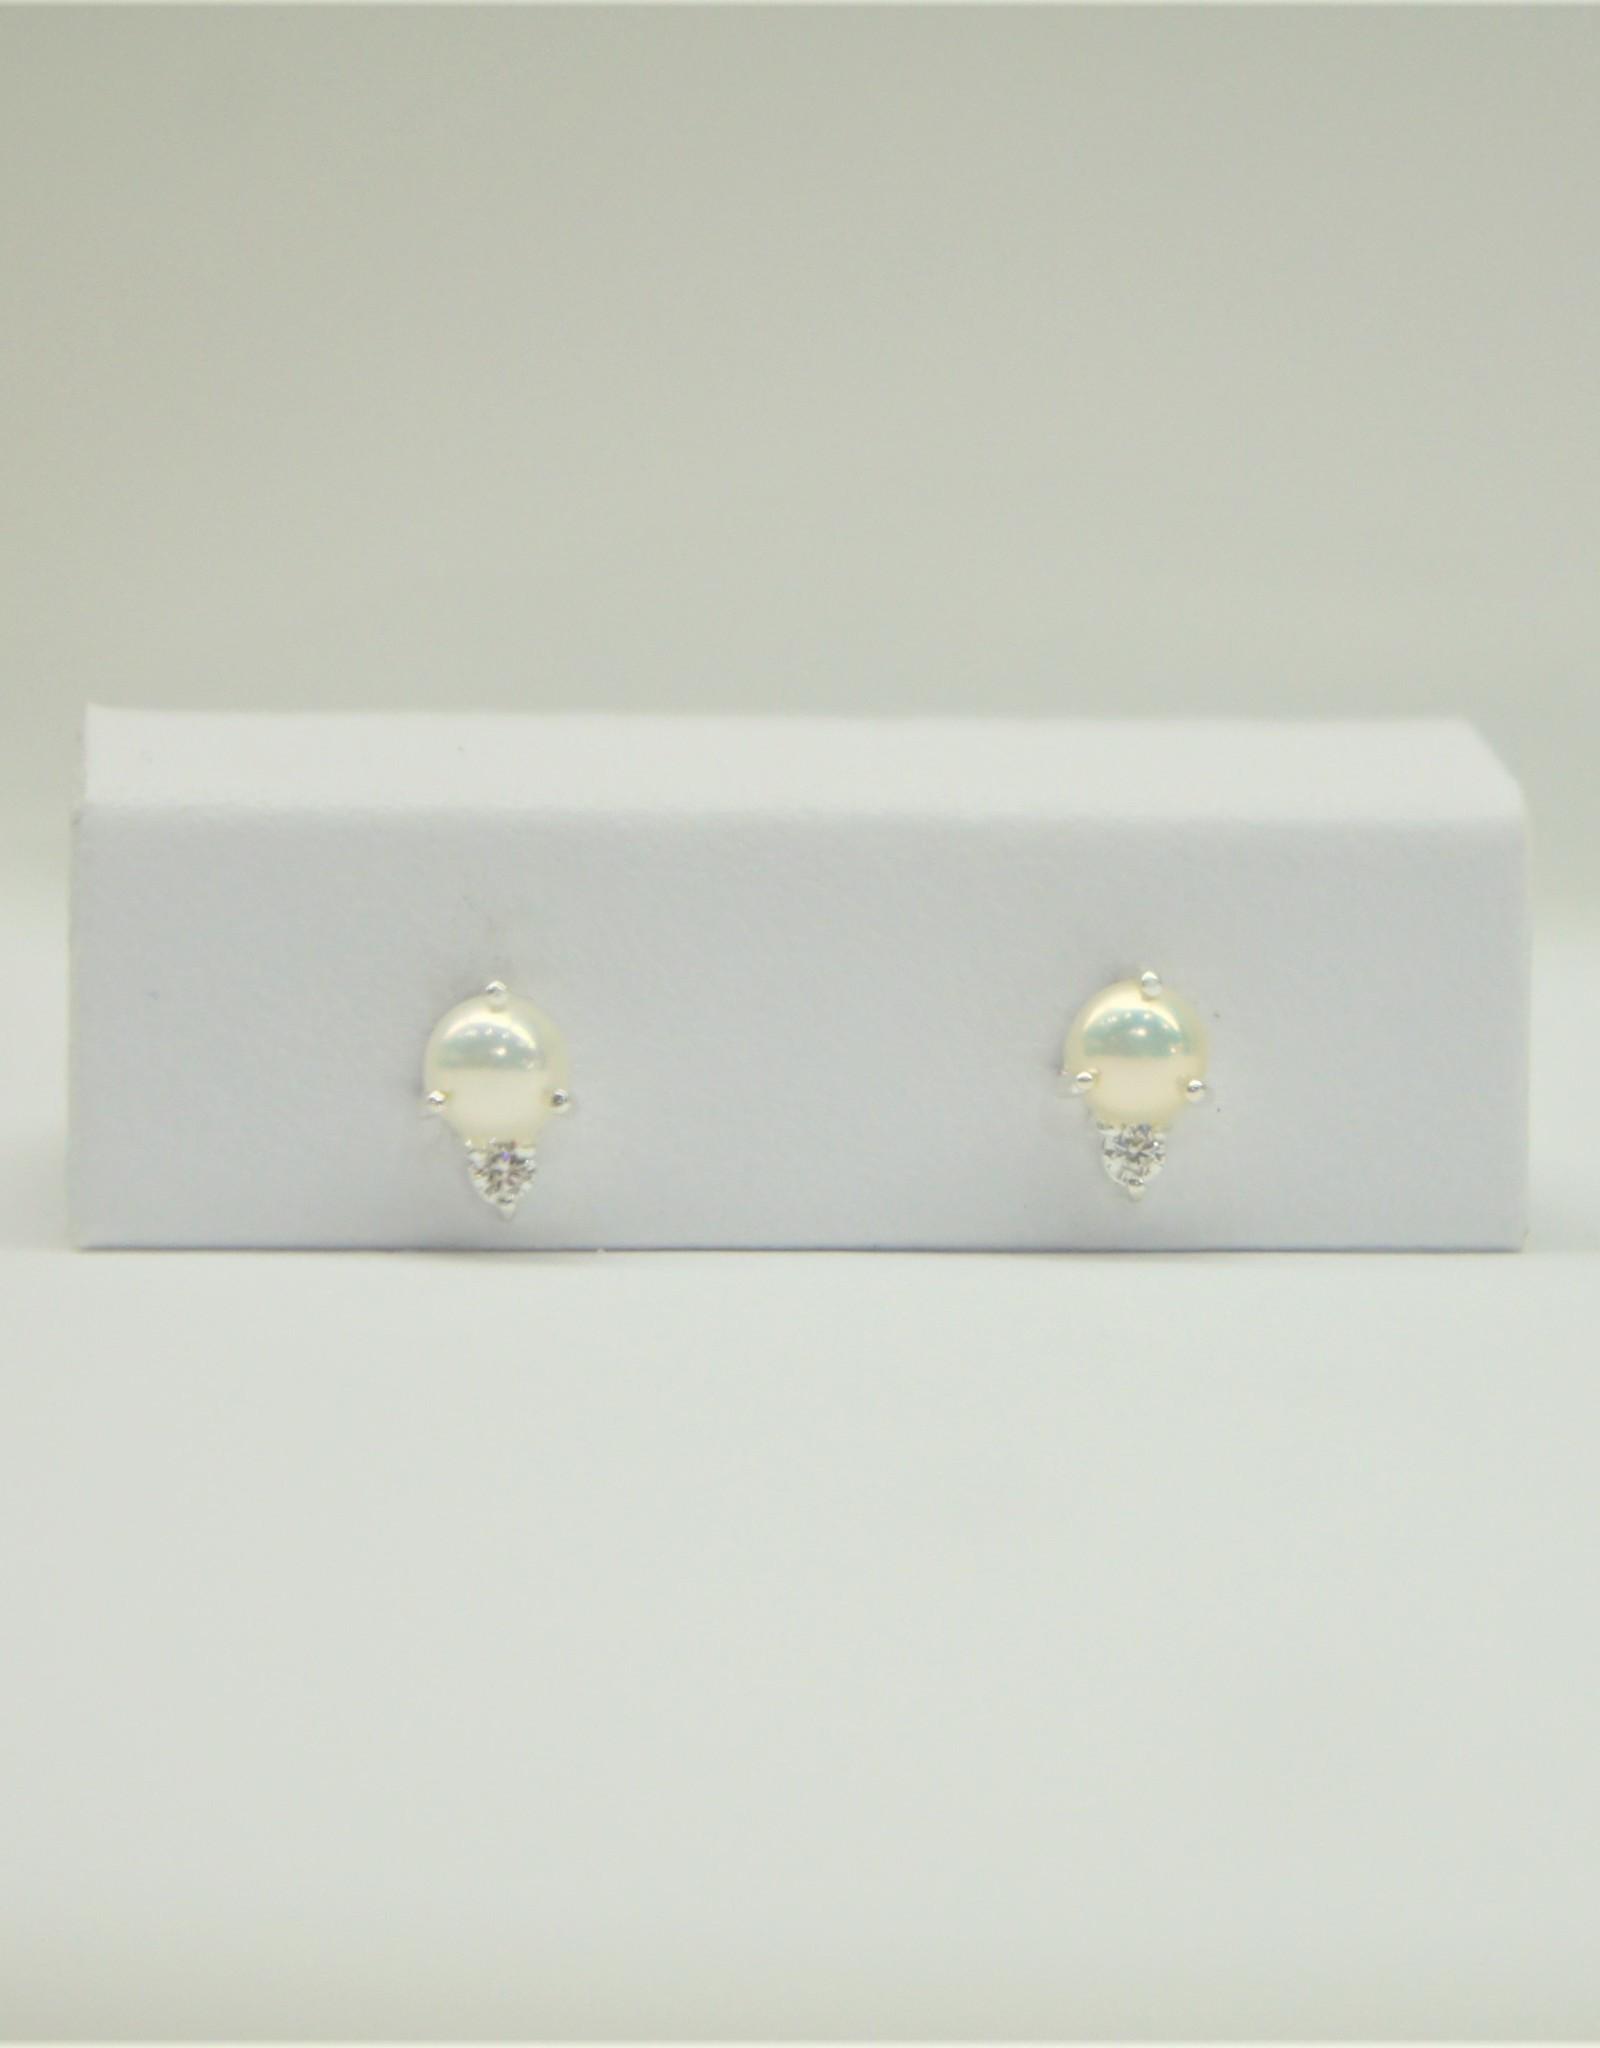 Tashi Pearl with Cubic Zirconia Stud Earrings